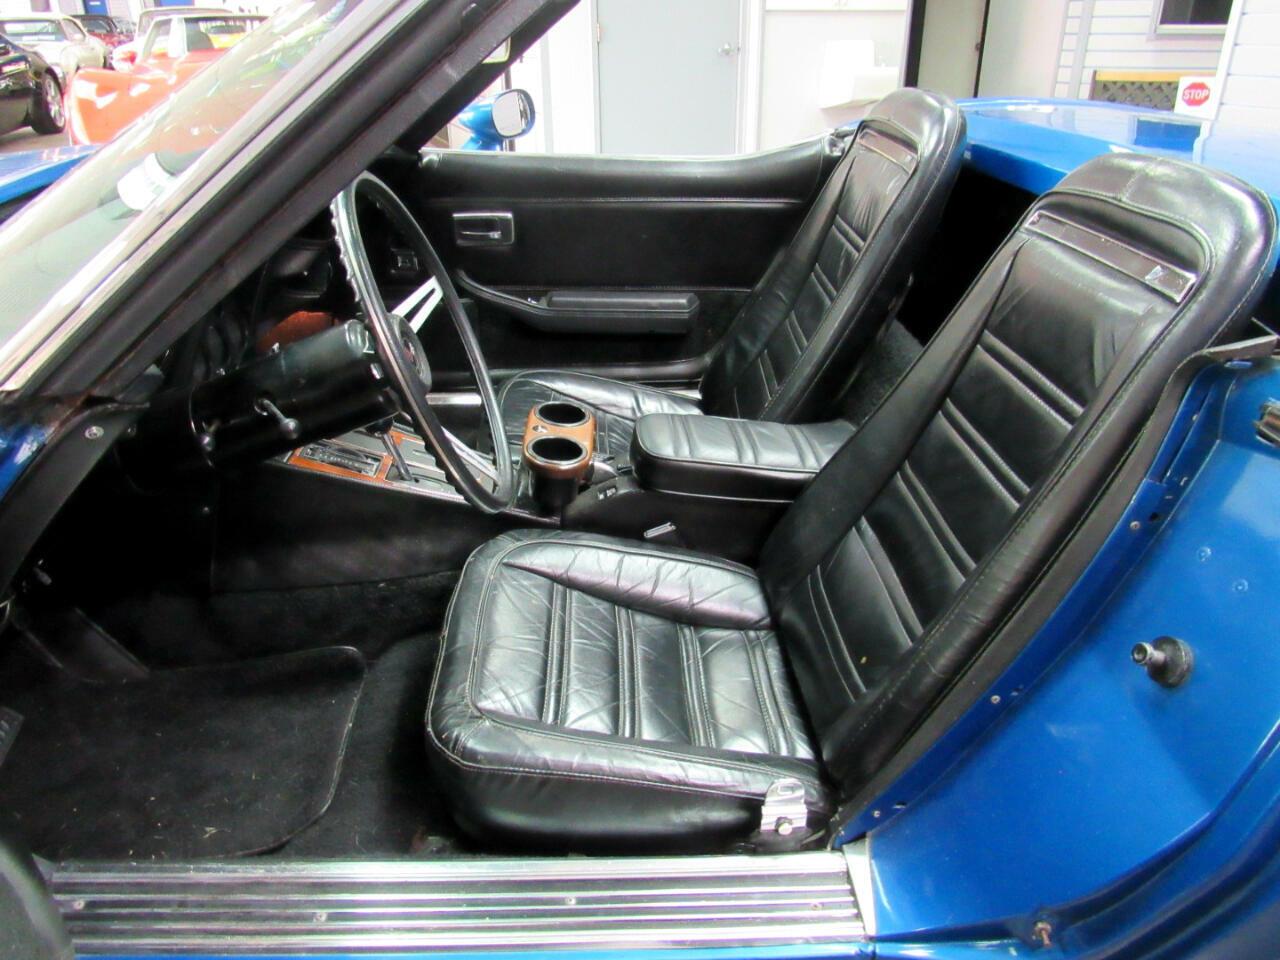 1974 Blue Chevrolet Corvette Convertible  | C3 Corvette Photo 9